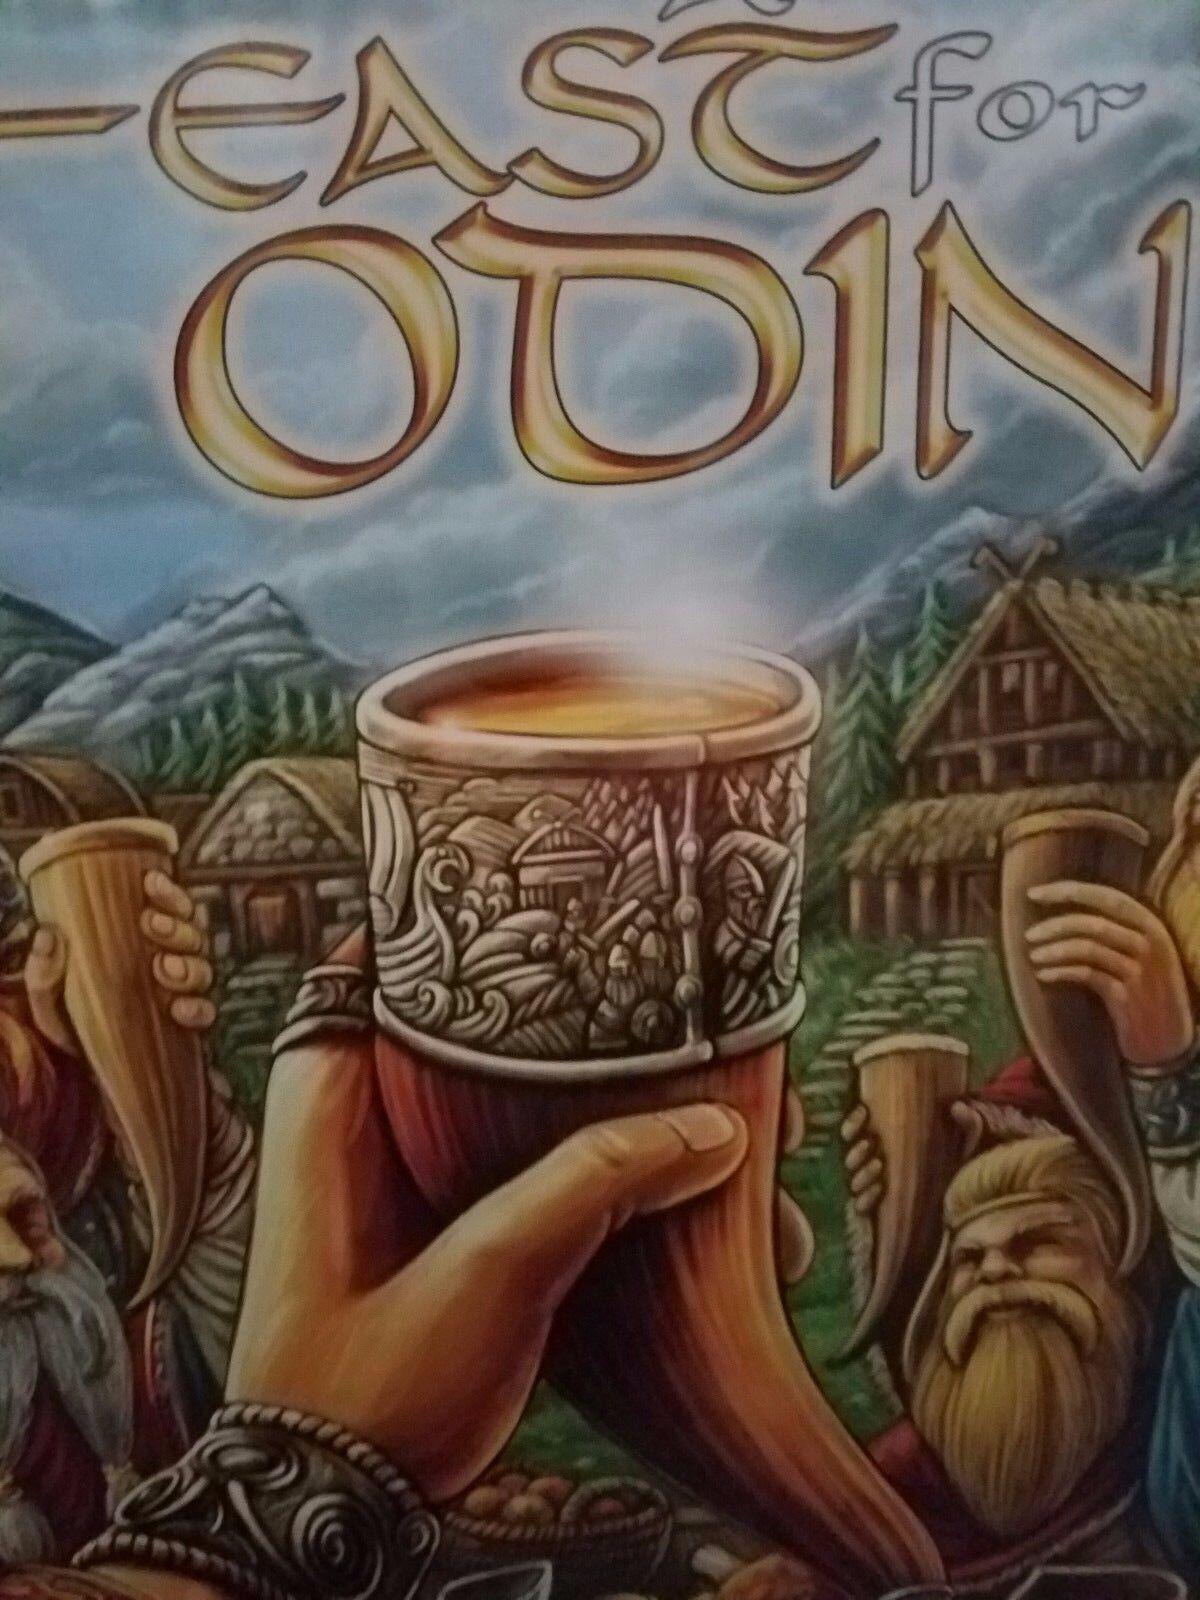 A Feast for Odin Odin Odin - Z-uomo giocos tavola gioco nuovo  9649cd